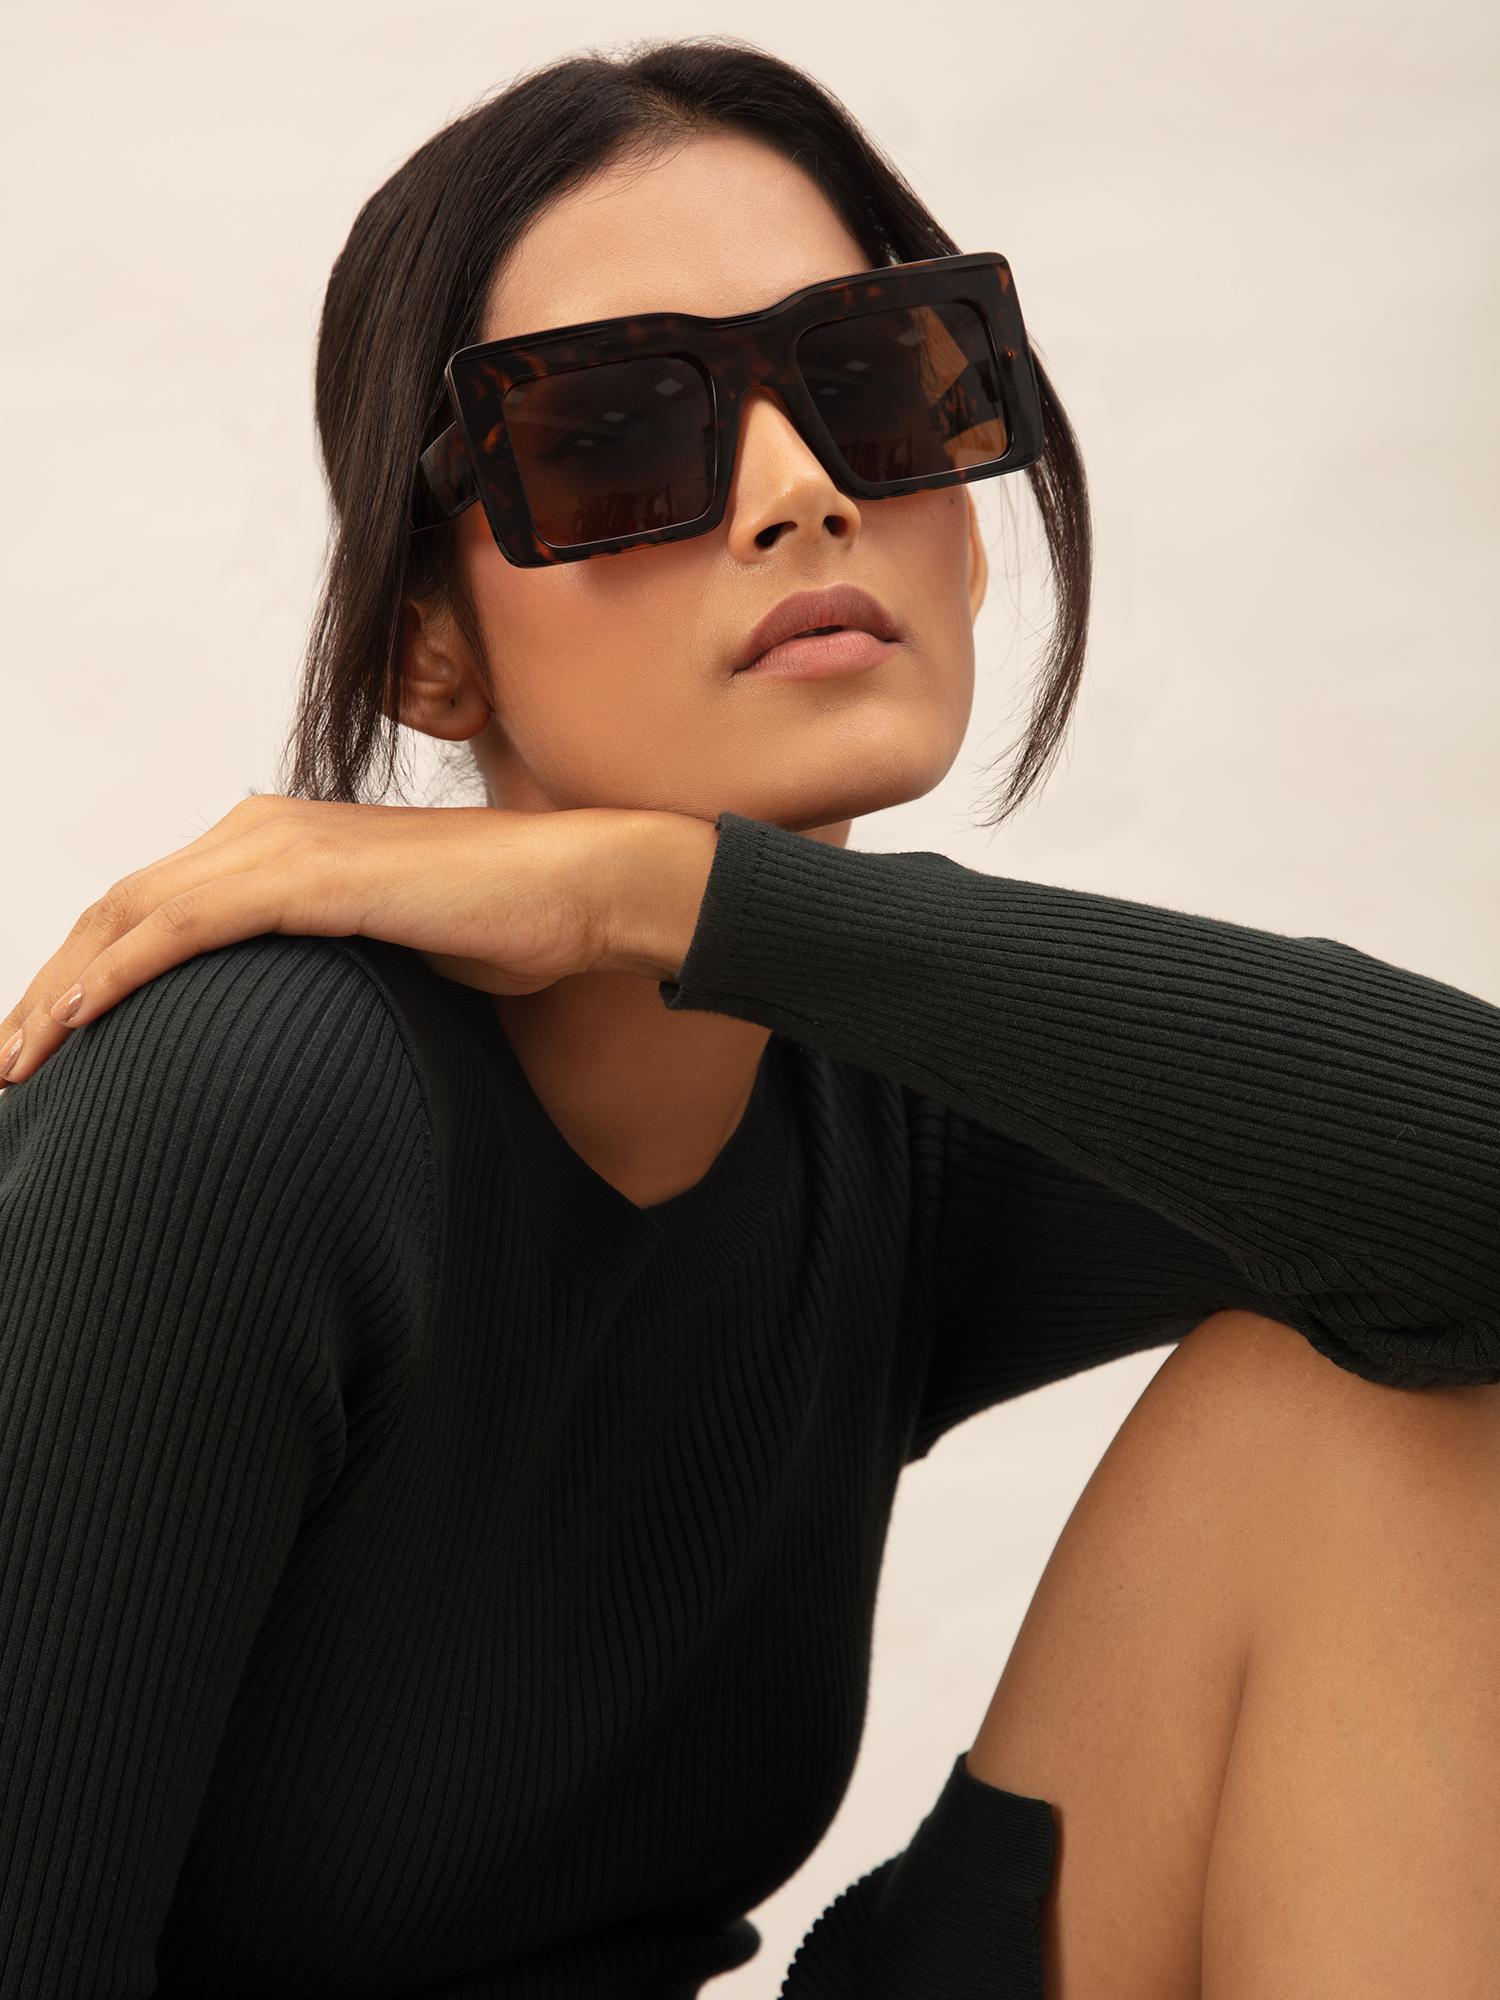 Sunglasses-Back To Square One Sunglasses1